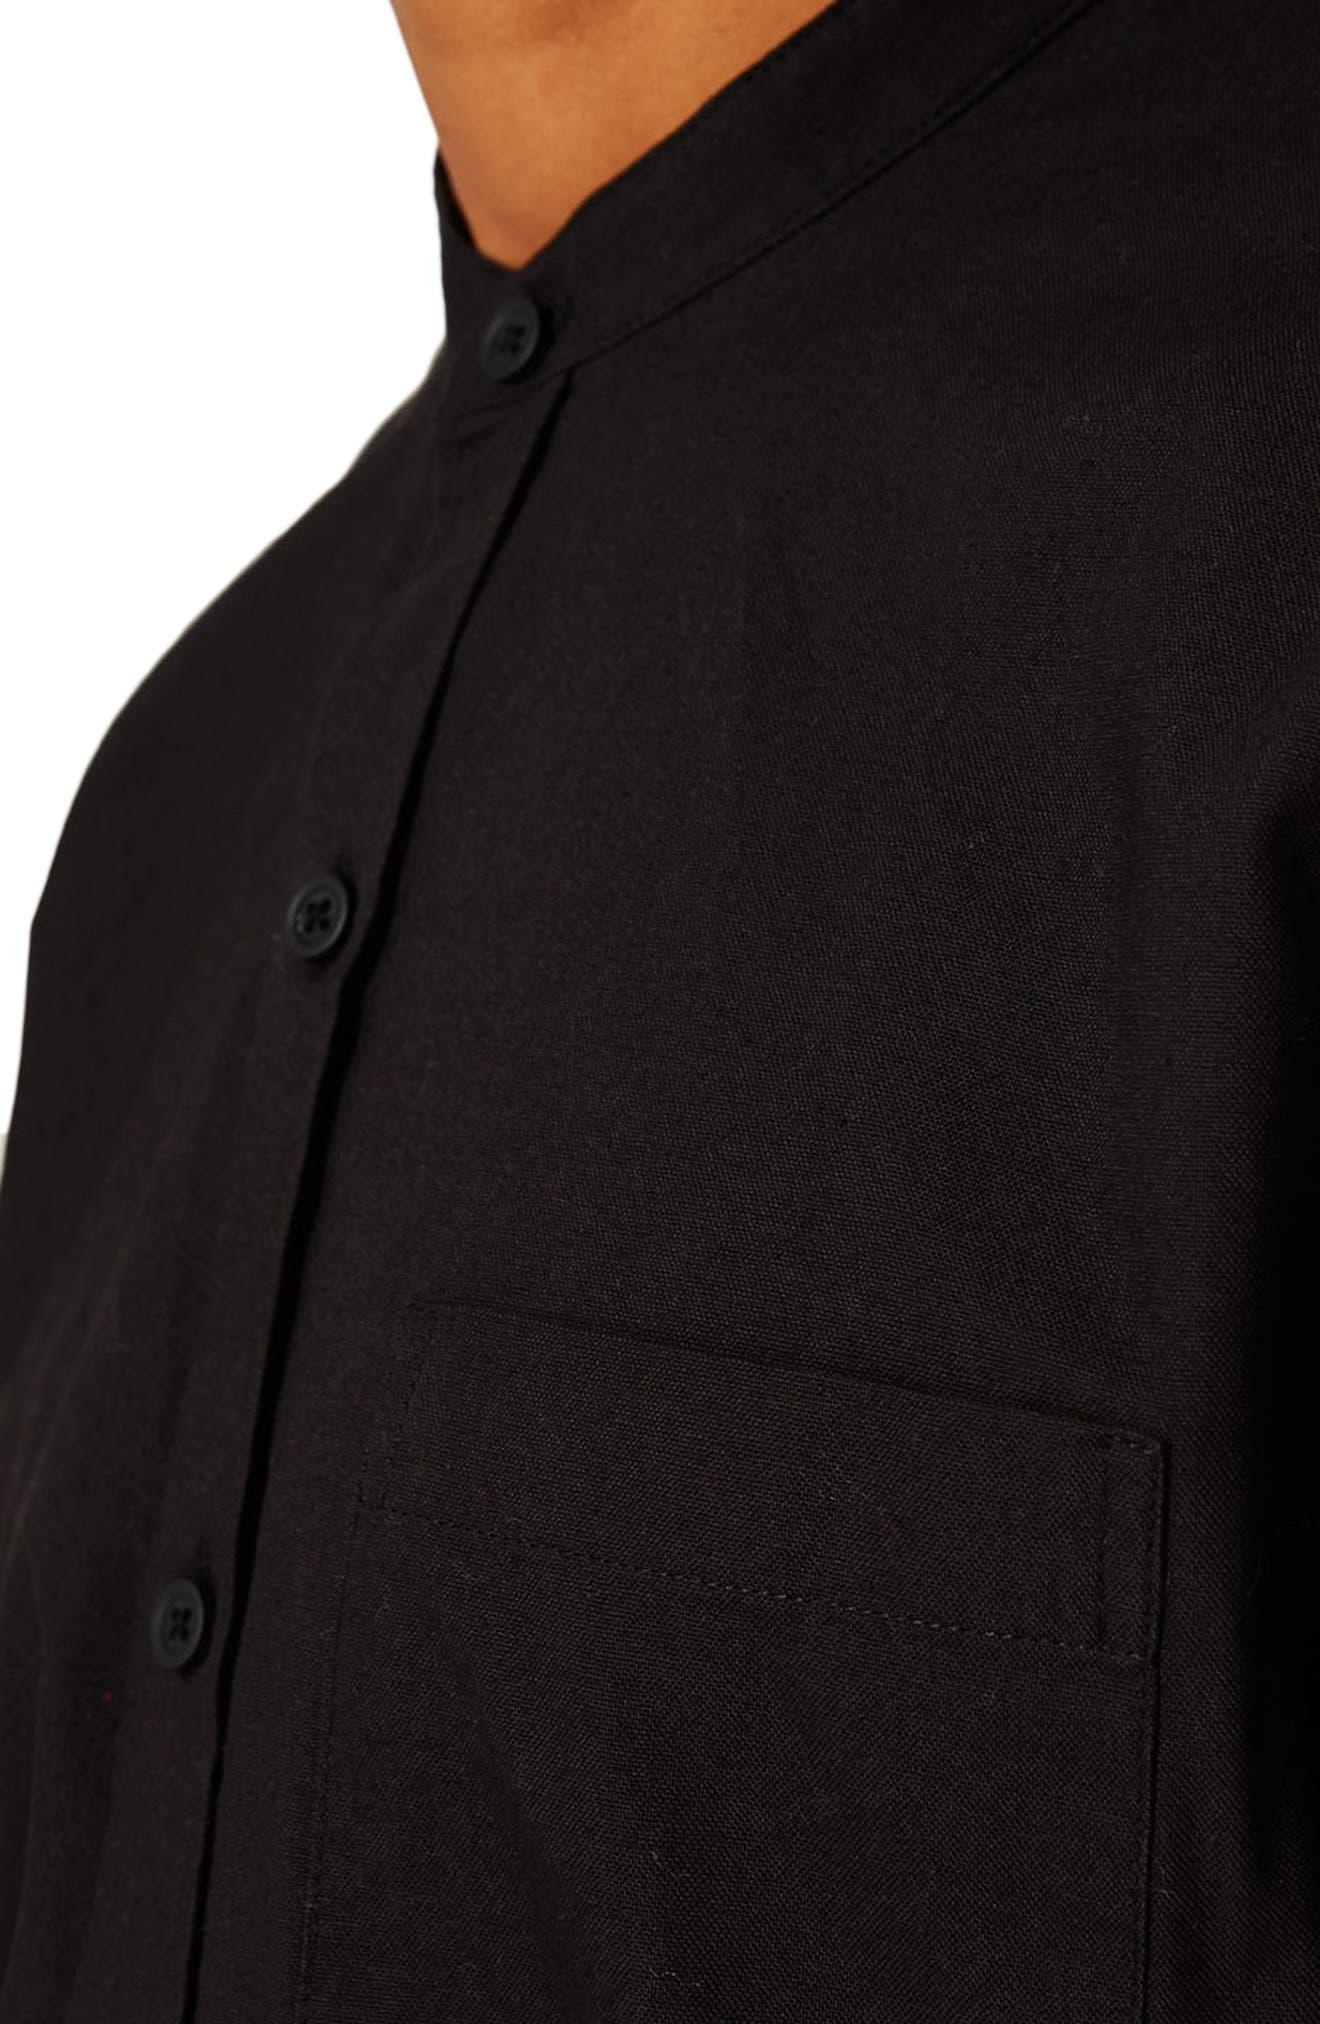 TOPMAN, Band Collar Shirt, Alternate thumbnail 2, color, 001